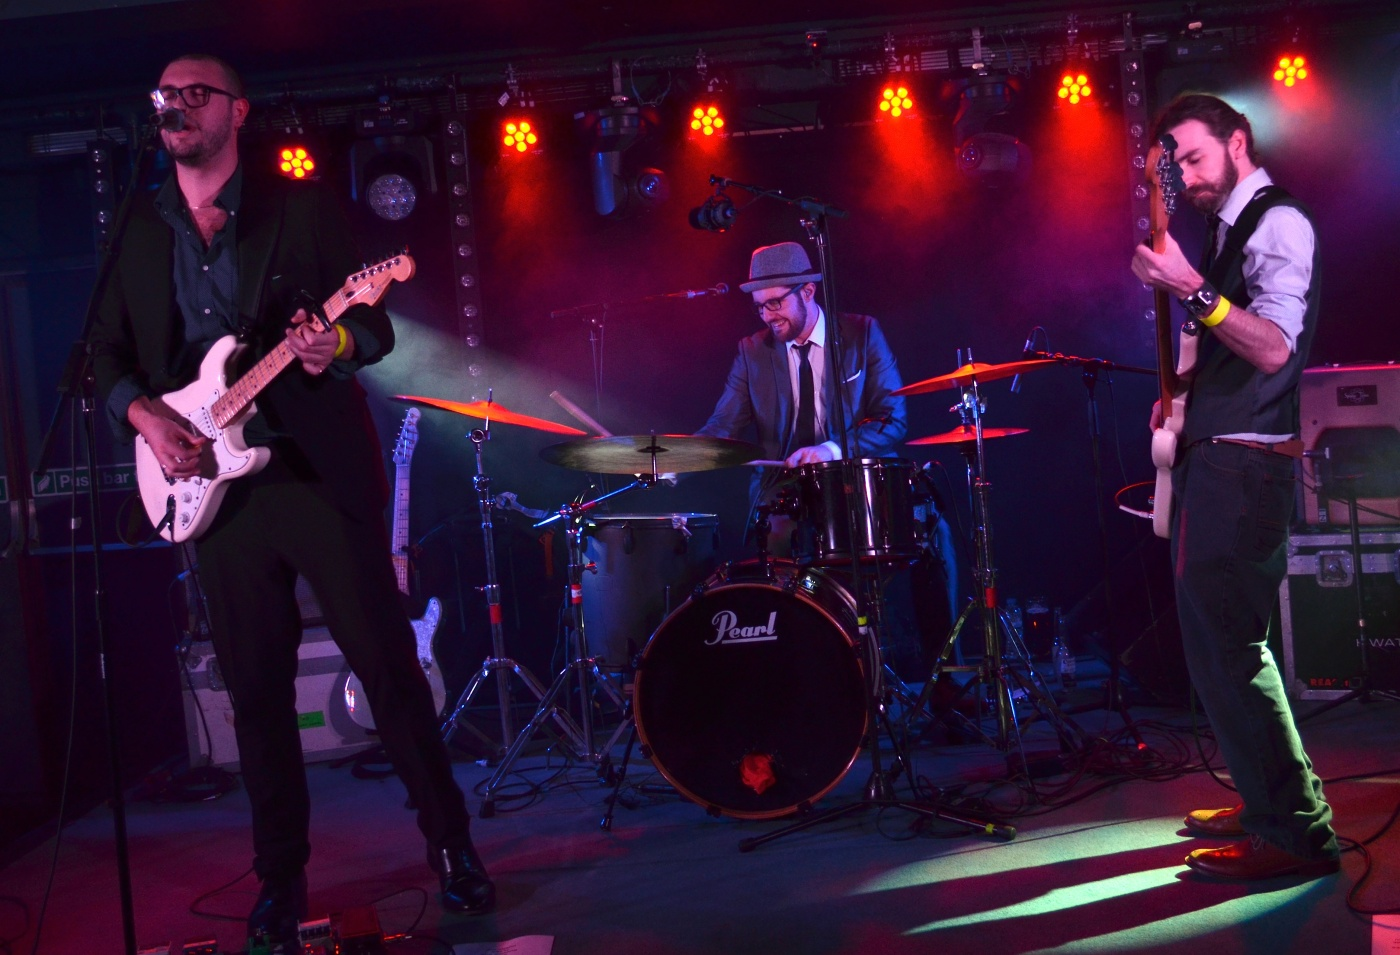 The Robert J. Hunter Band